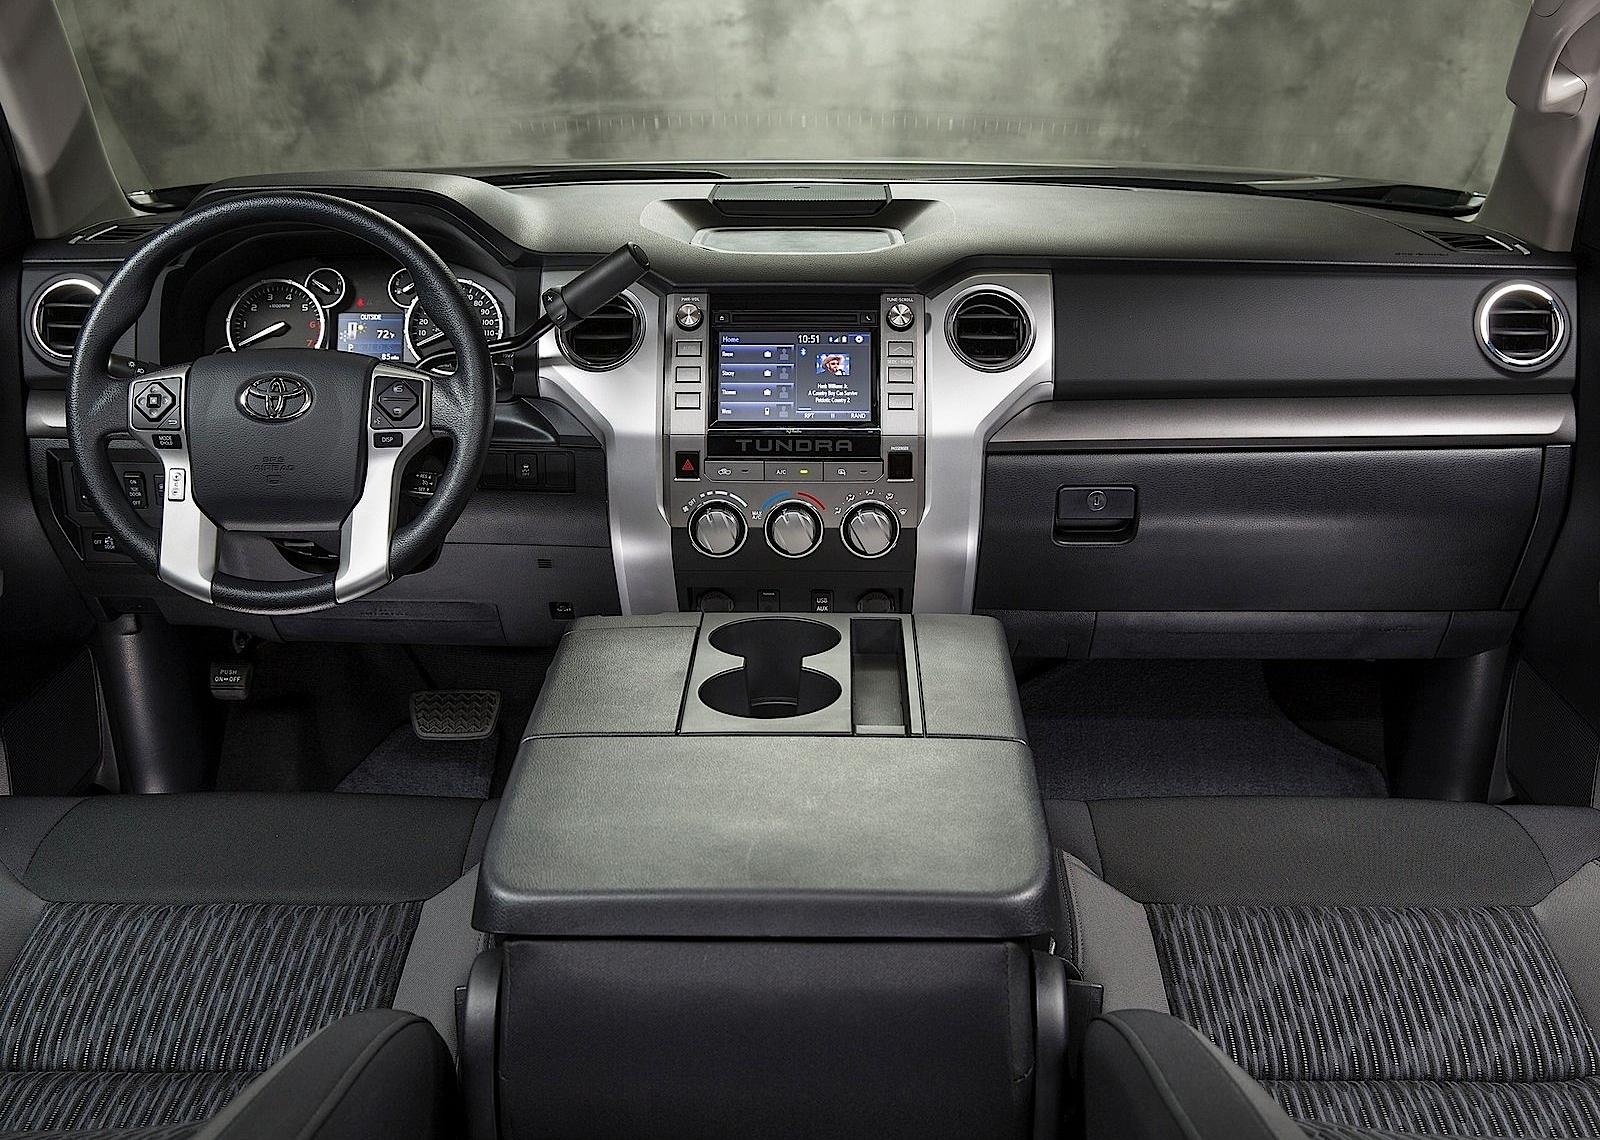 Toyota Tundra Crew Cab Specs Amp Photos 2013 2014 2015